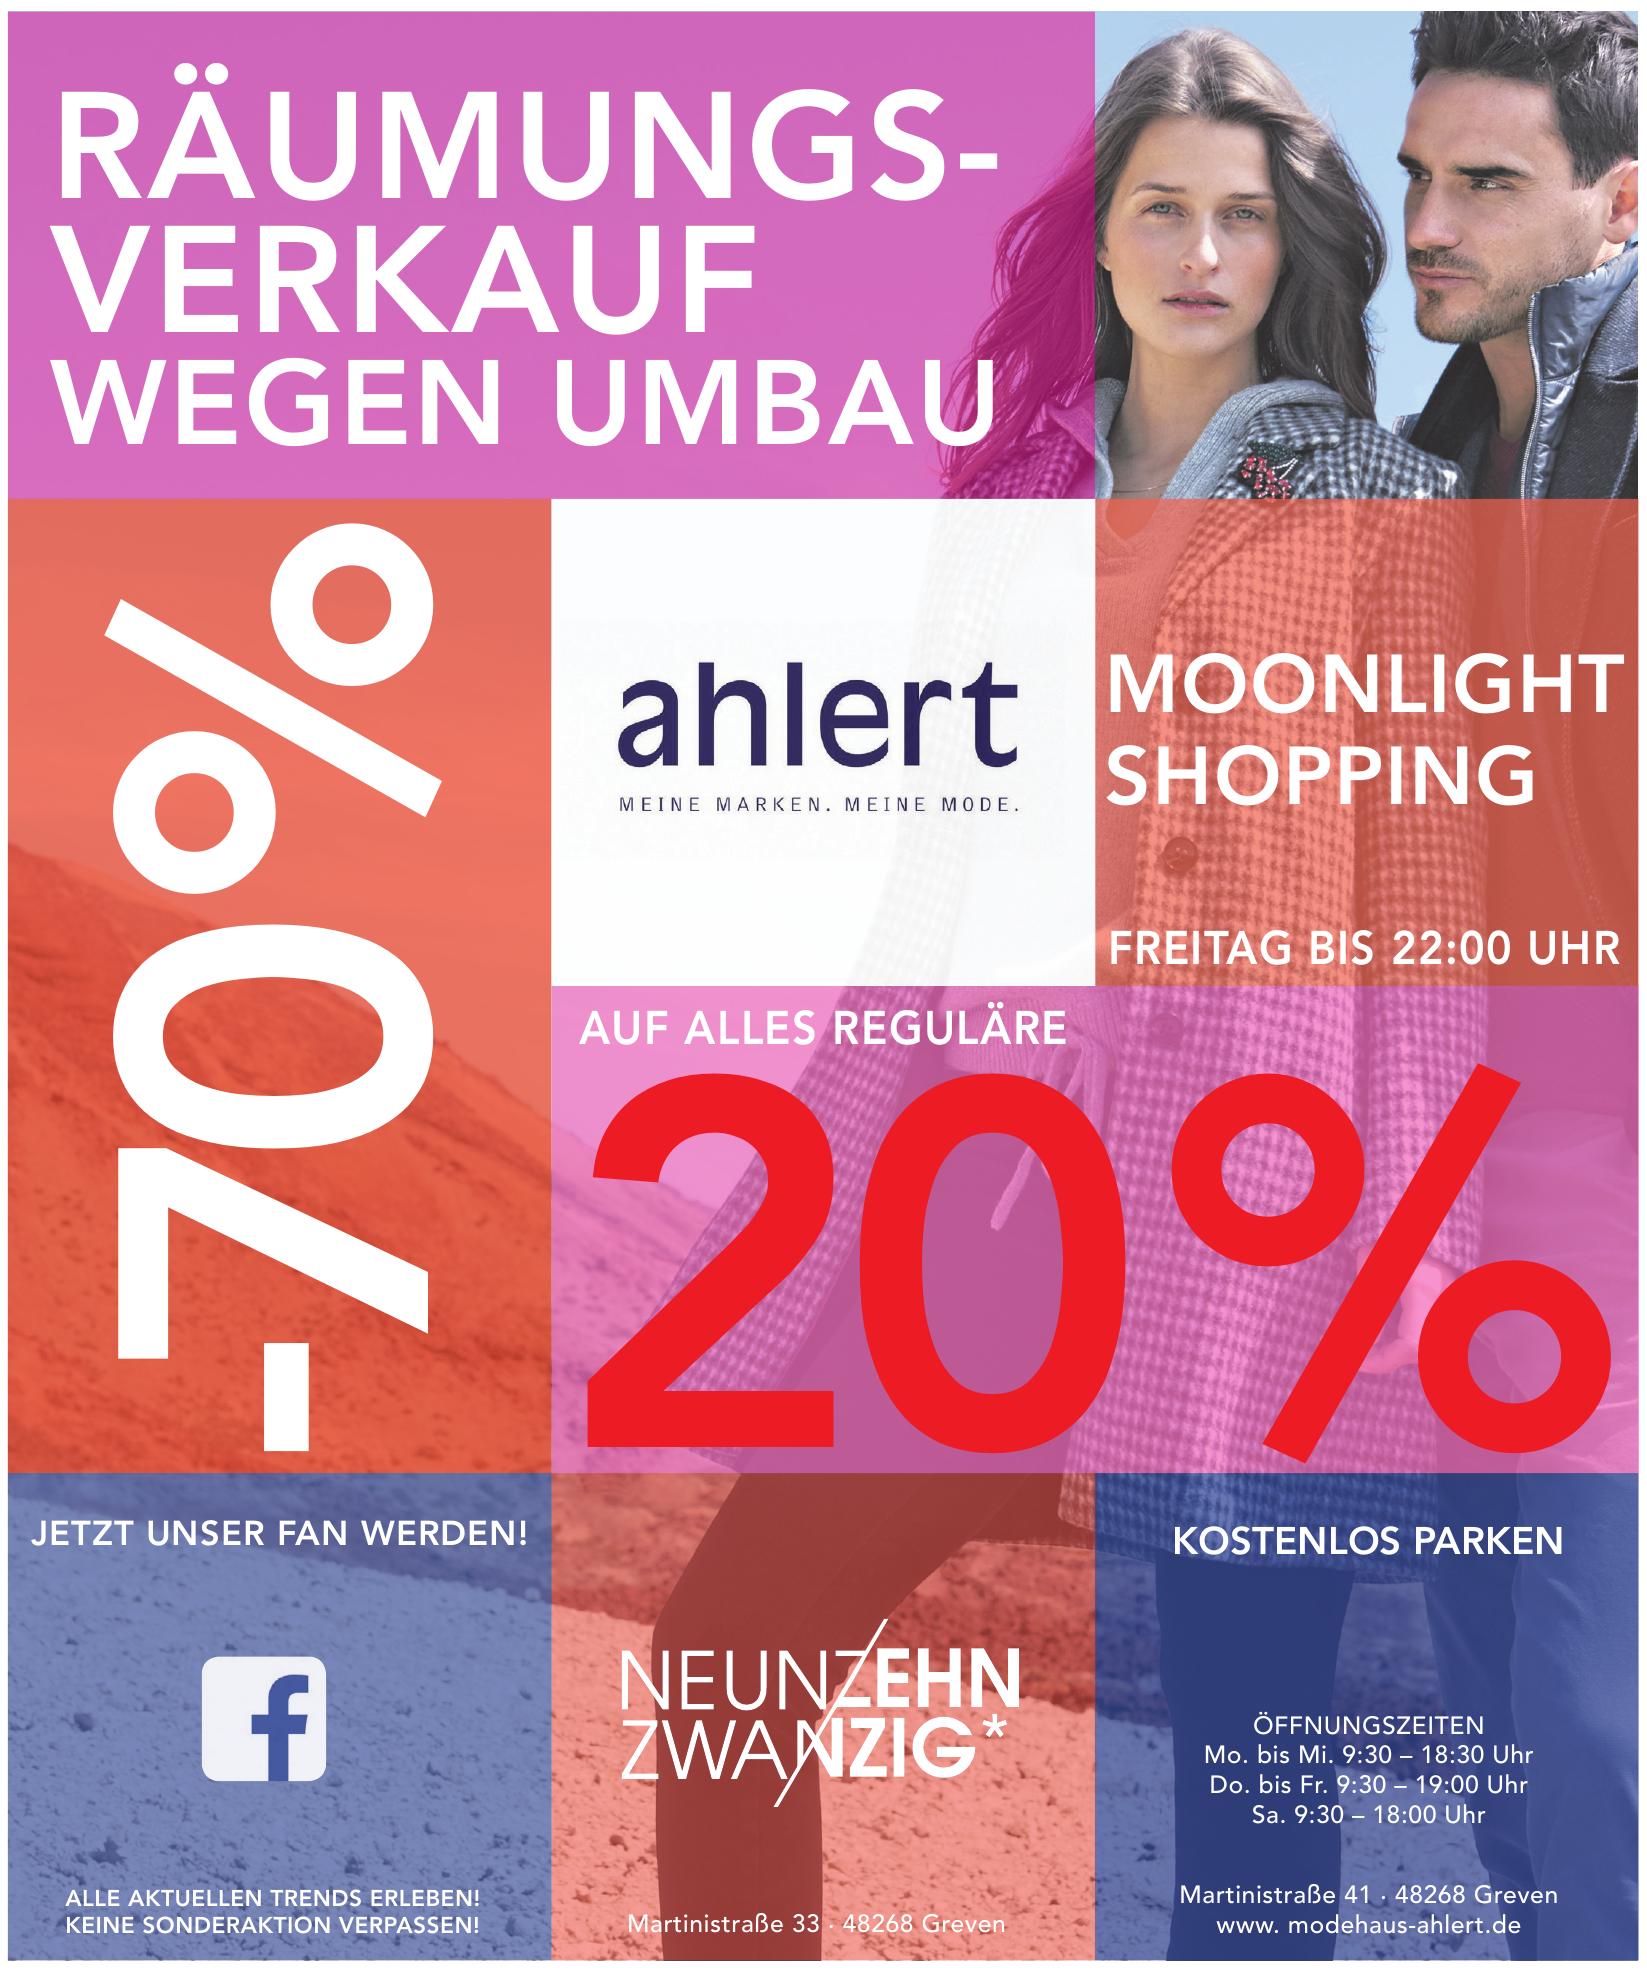 Modehaus Ahlert